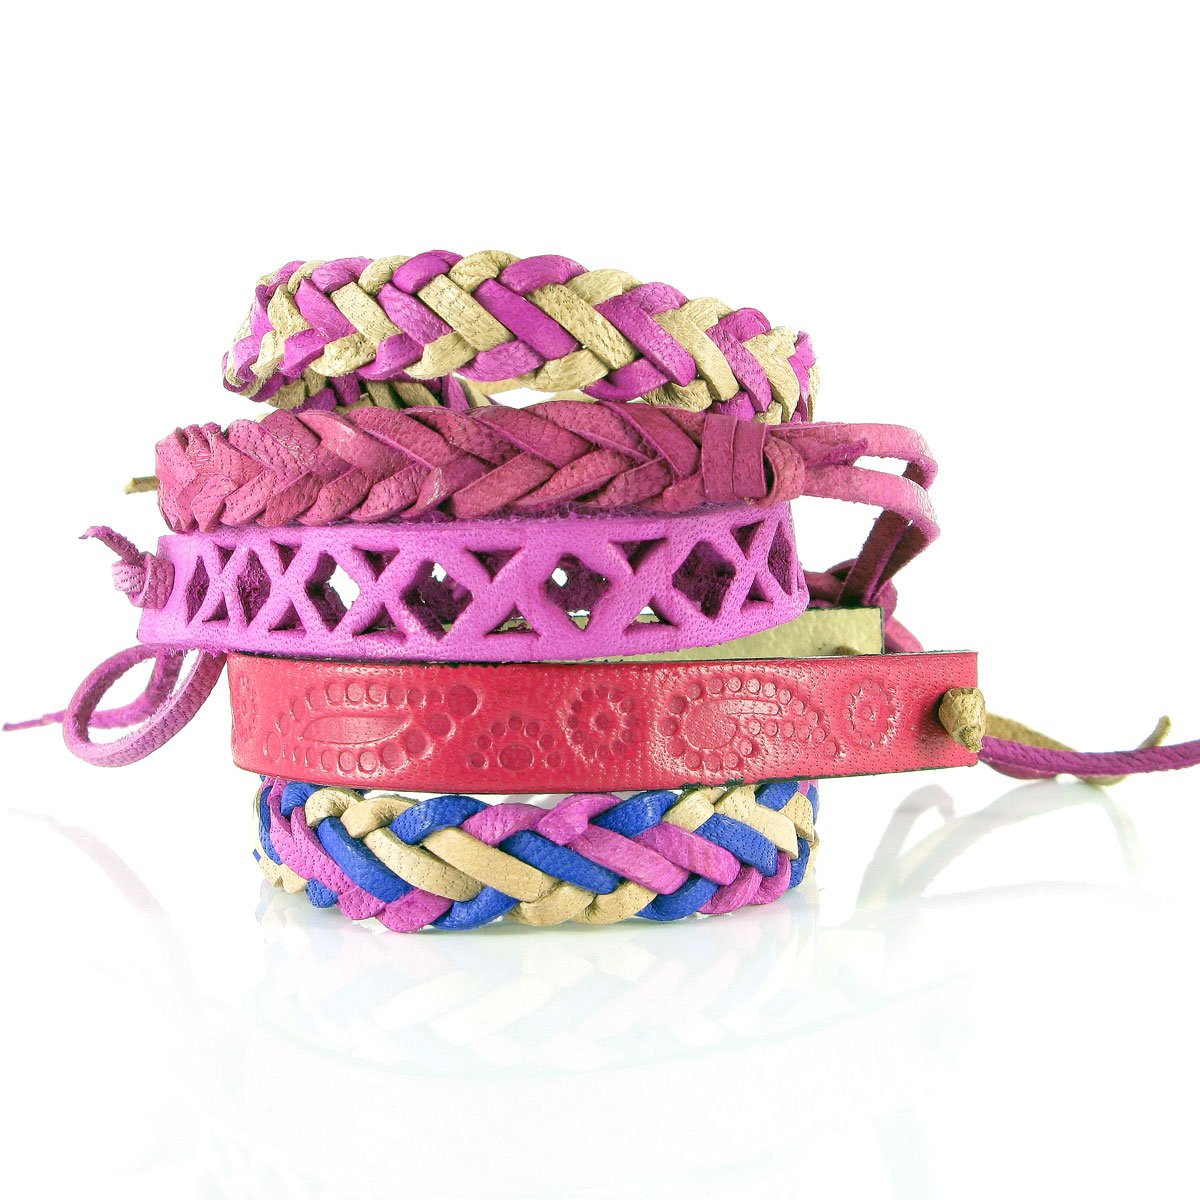 Ettika Braided Satin Cord Bracelet w/Single Charm - WHATS